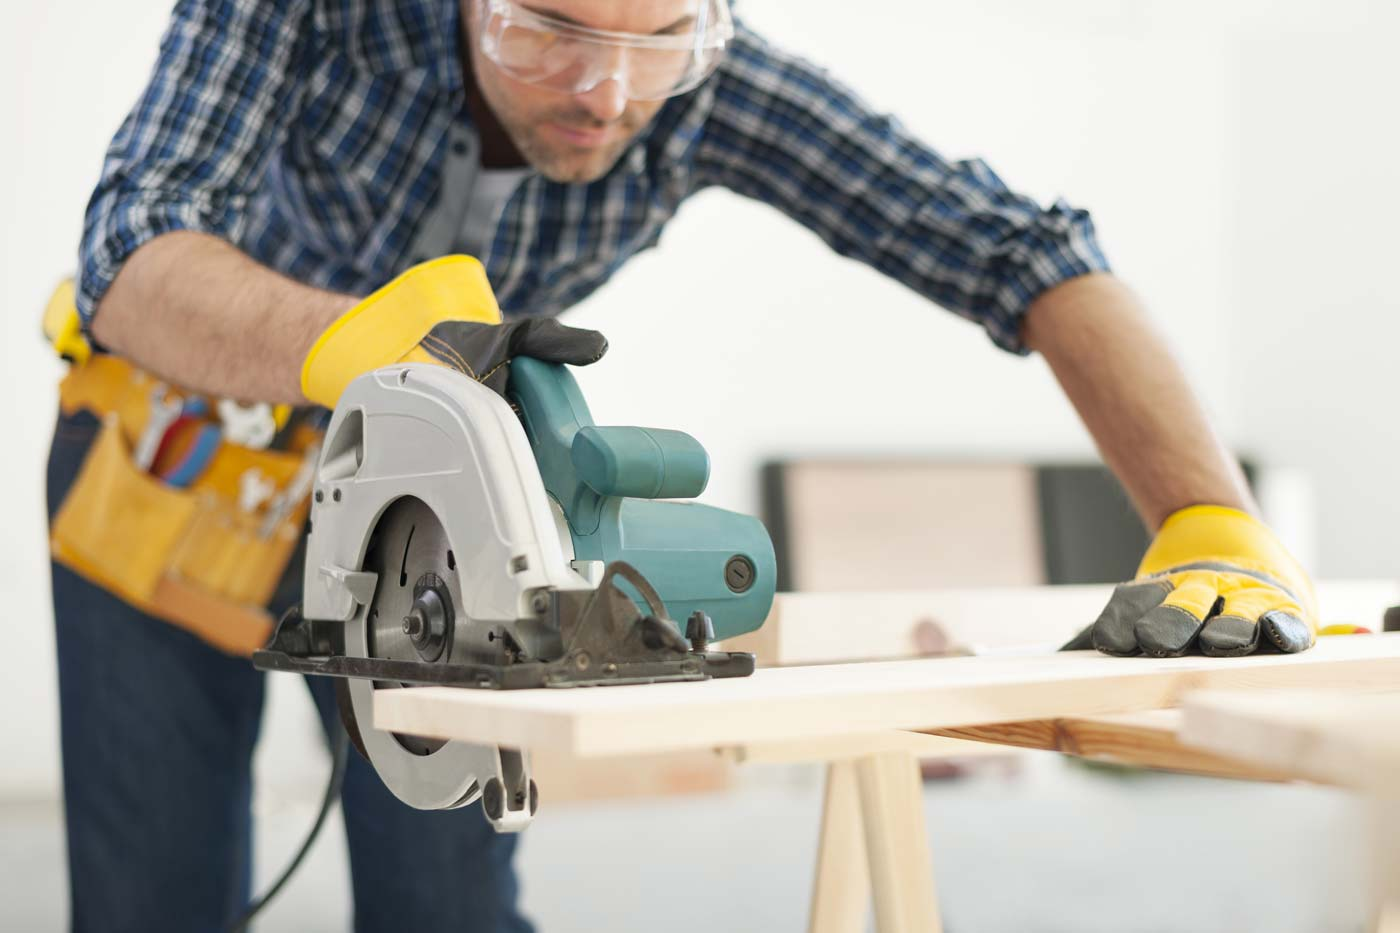 OSHA Construction Hand and Power Tool Safety